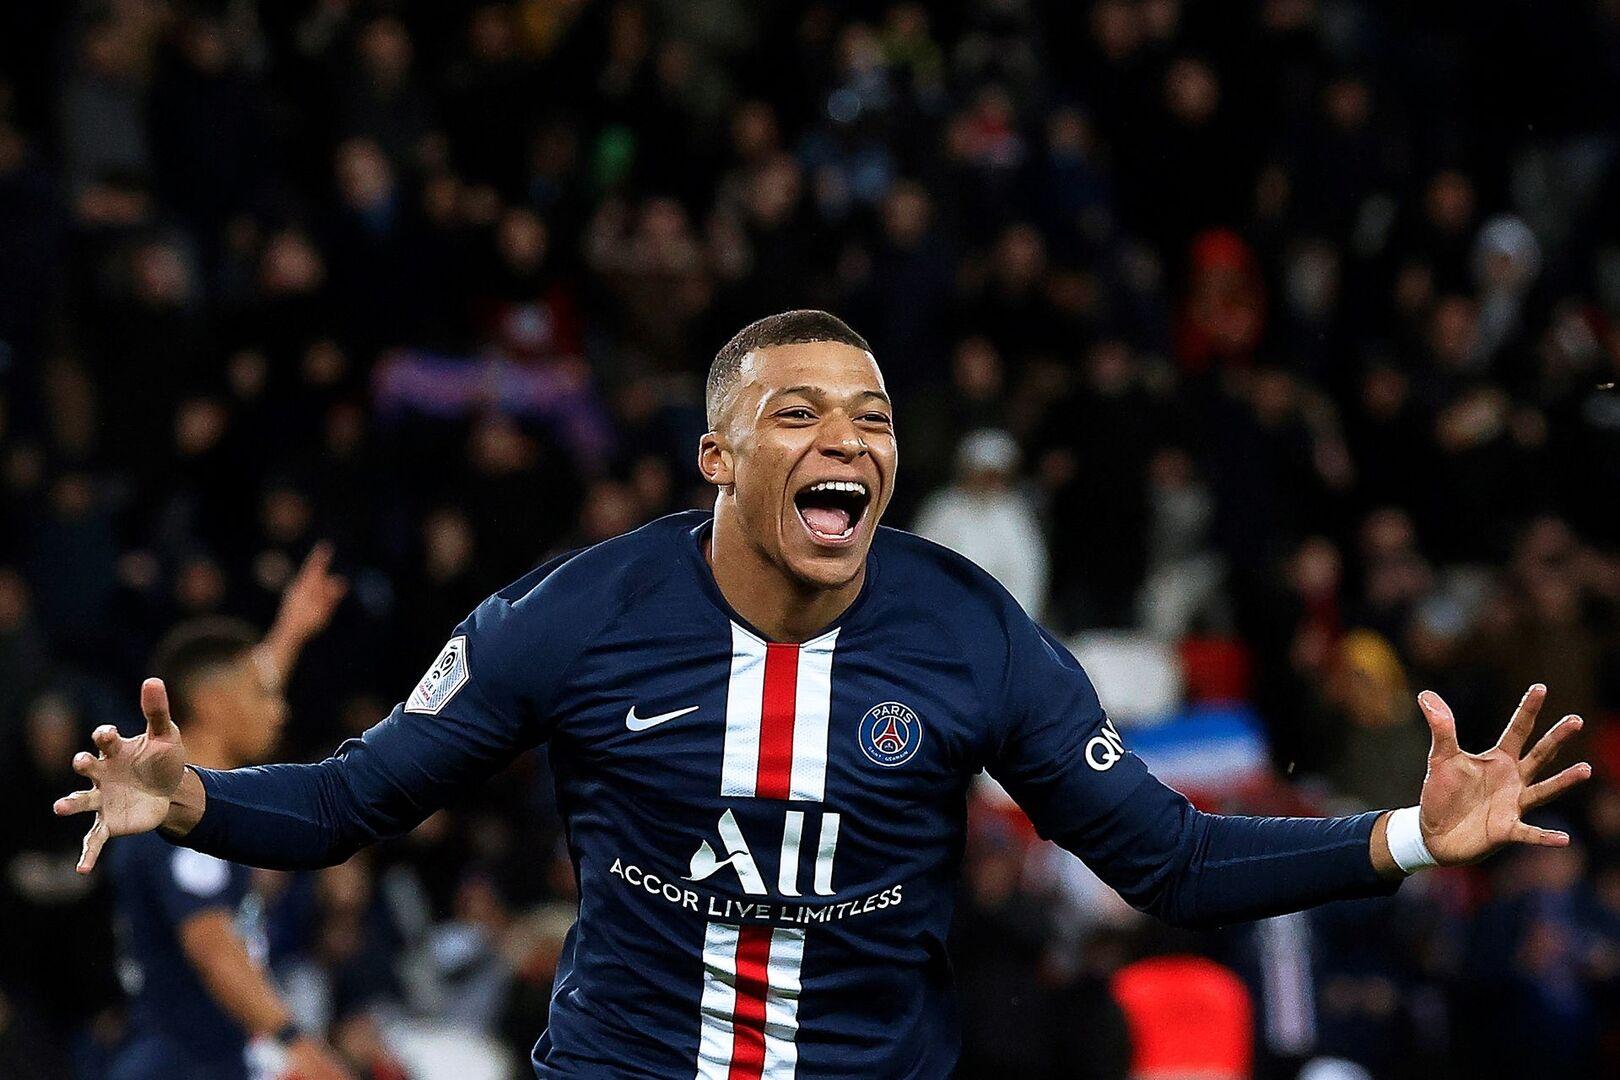 Kylian Mbappé quiere marcharse del PSG el proximo año